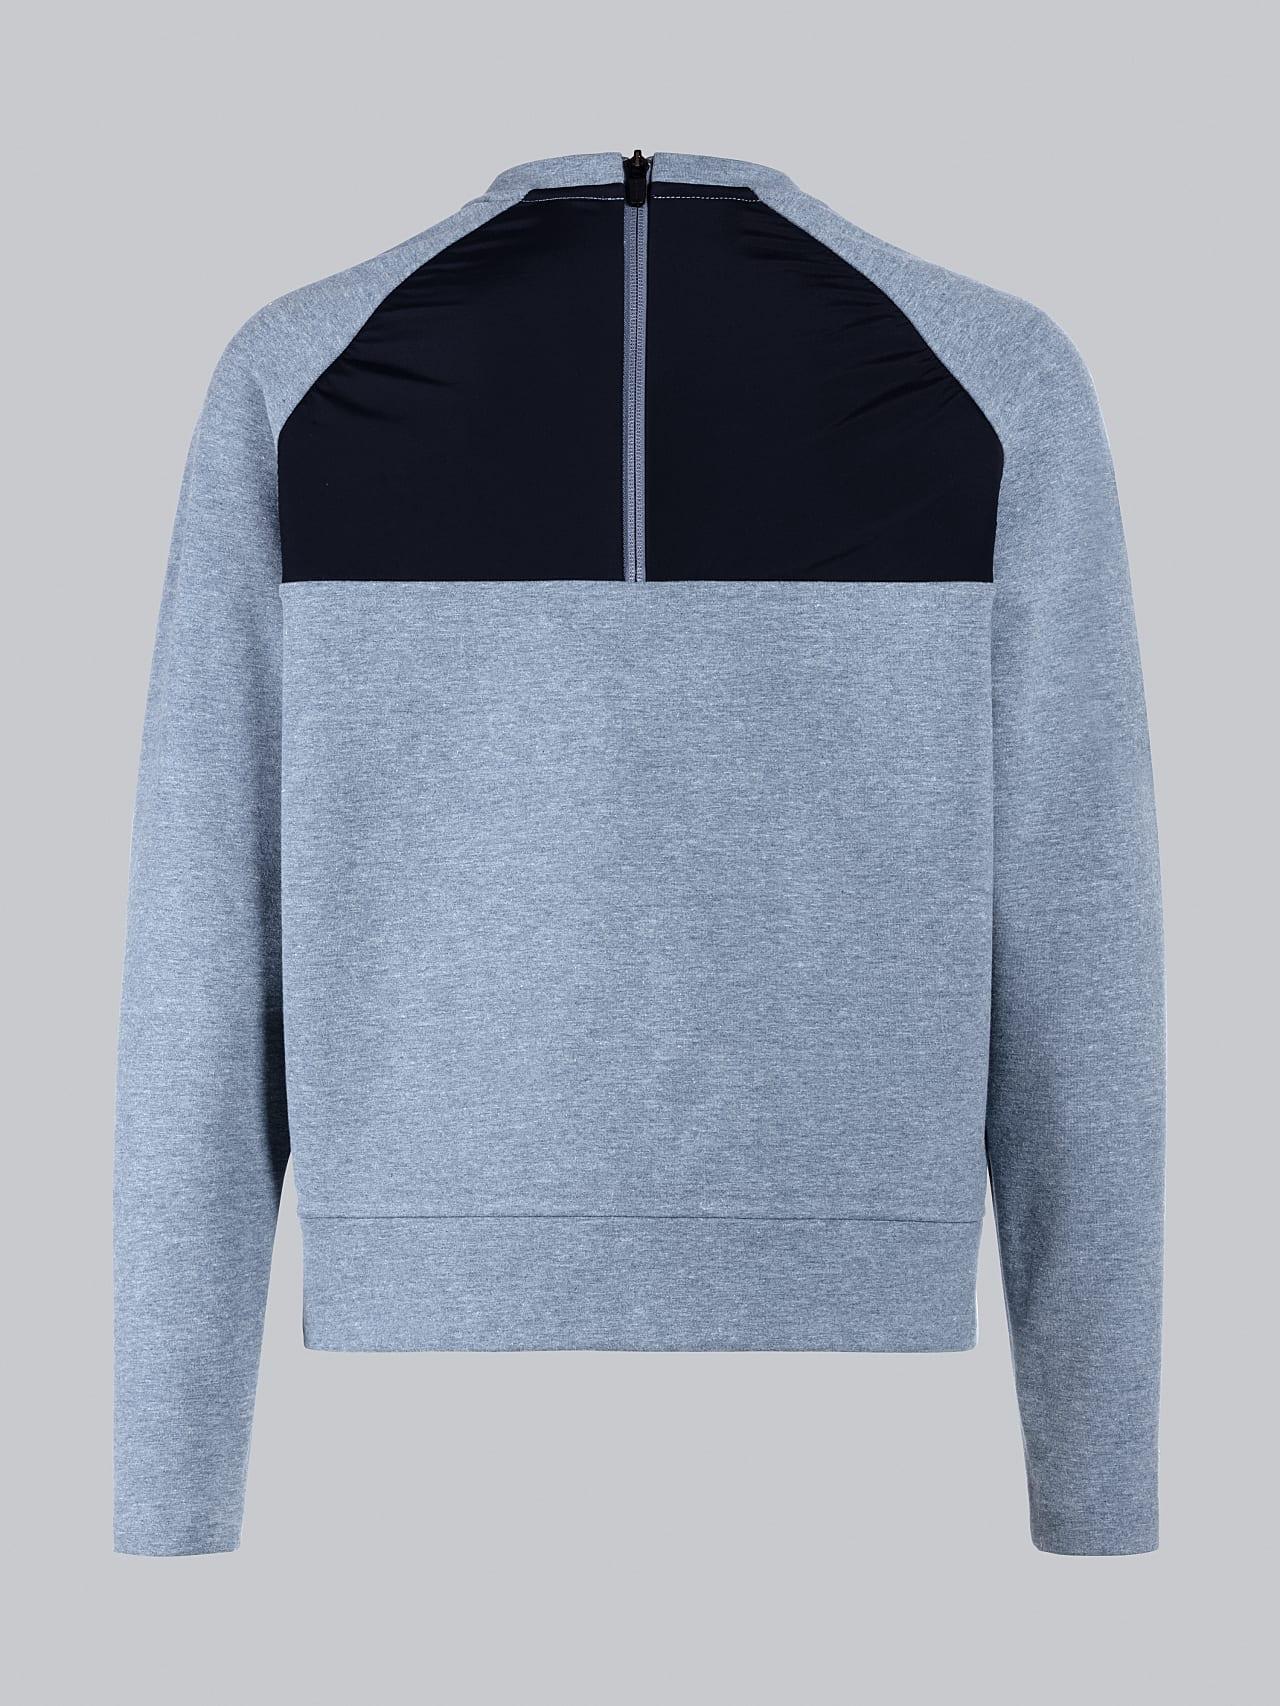 SRONI V2.Y5.02 Waterproof Sweatshirt medium blue Left Alpha Tauri